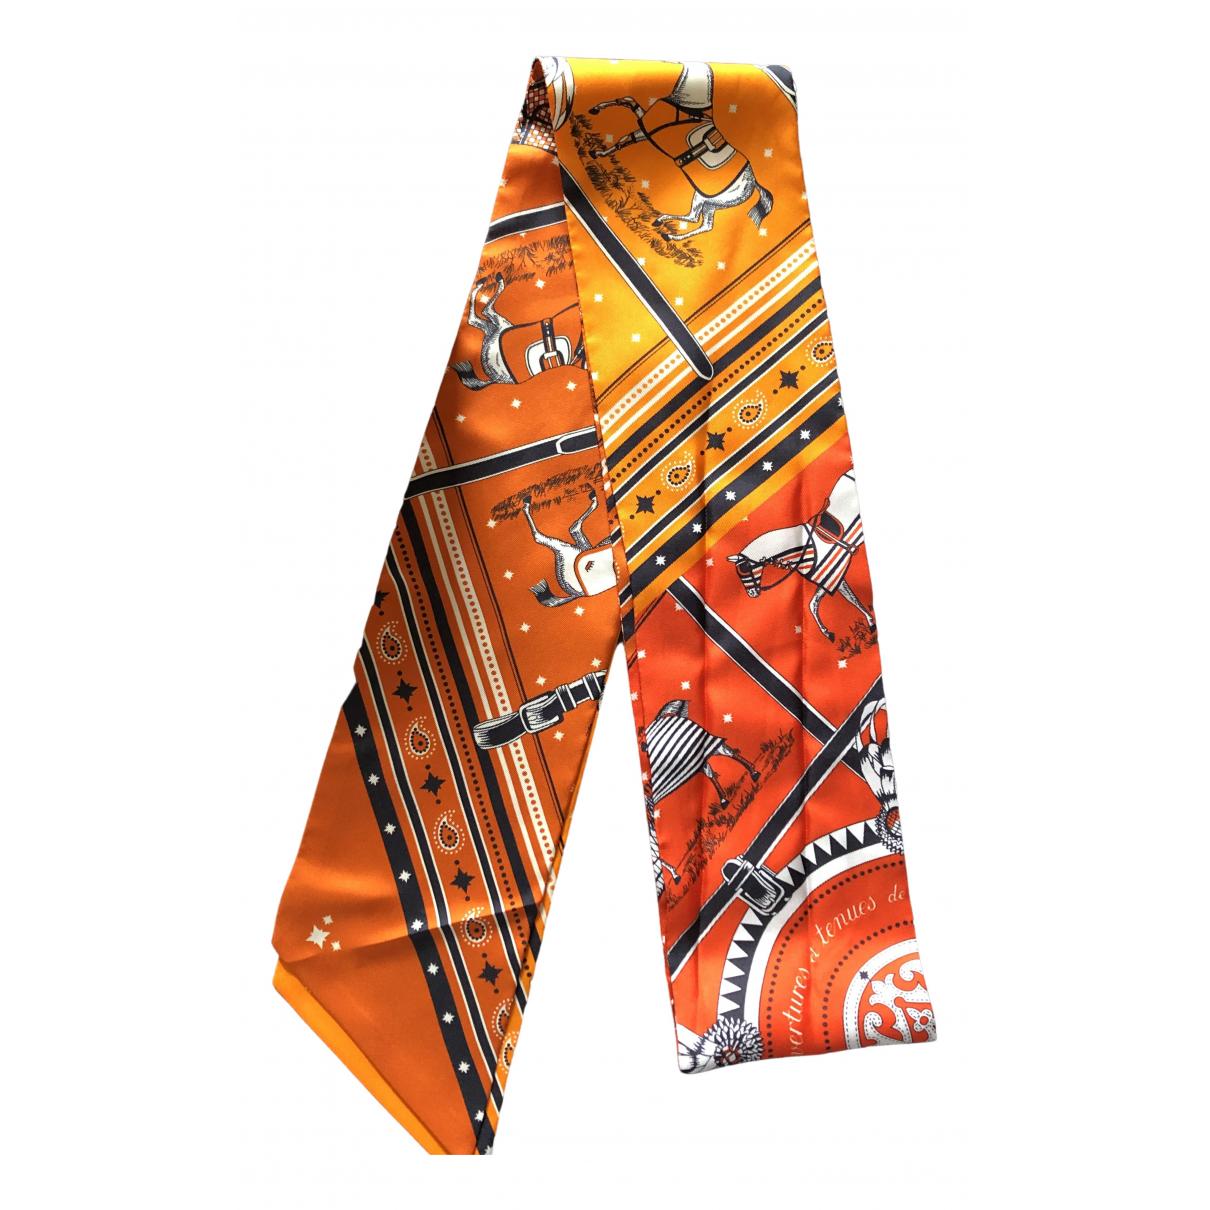 Hermes - Foulard Maxi twilly pour femme en soie - orange